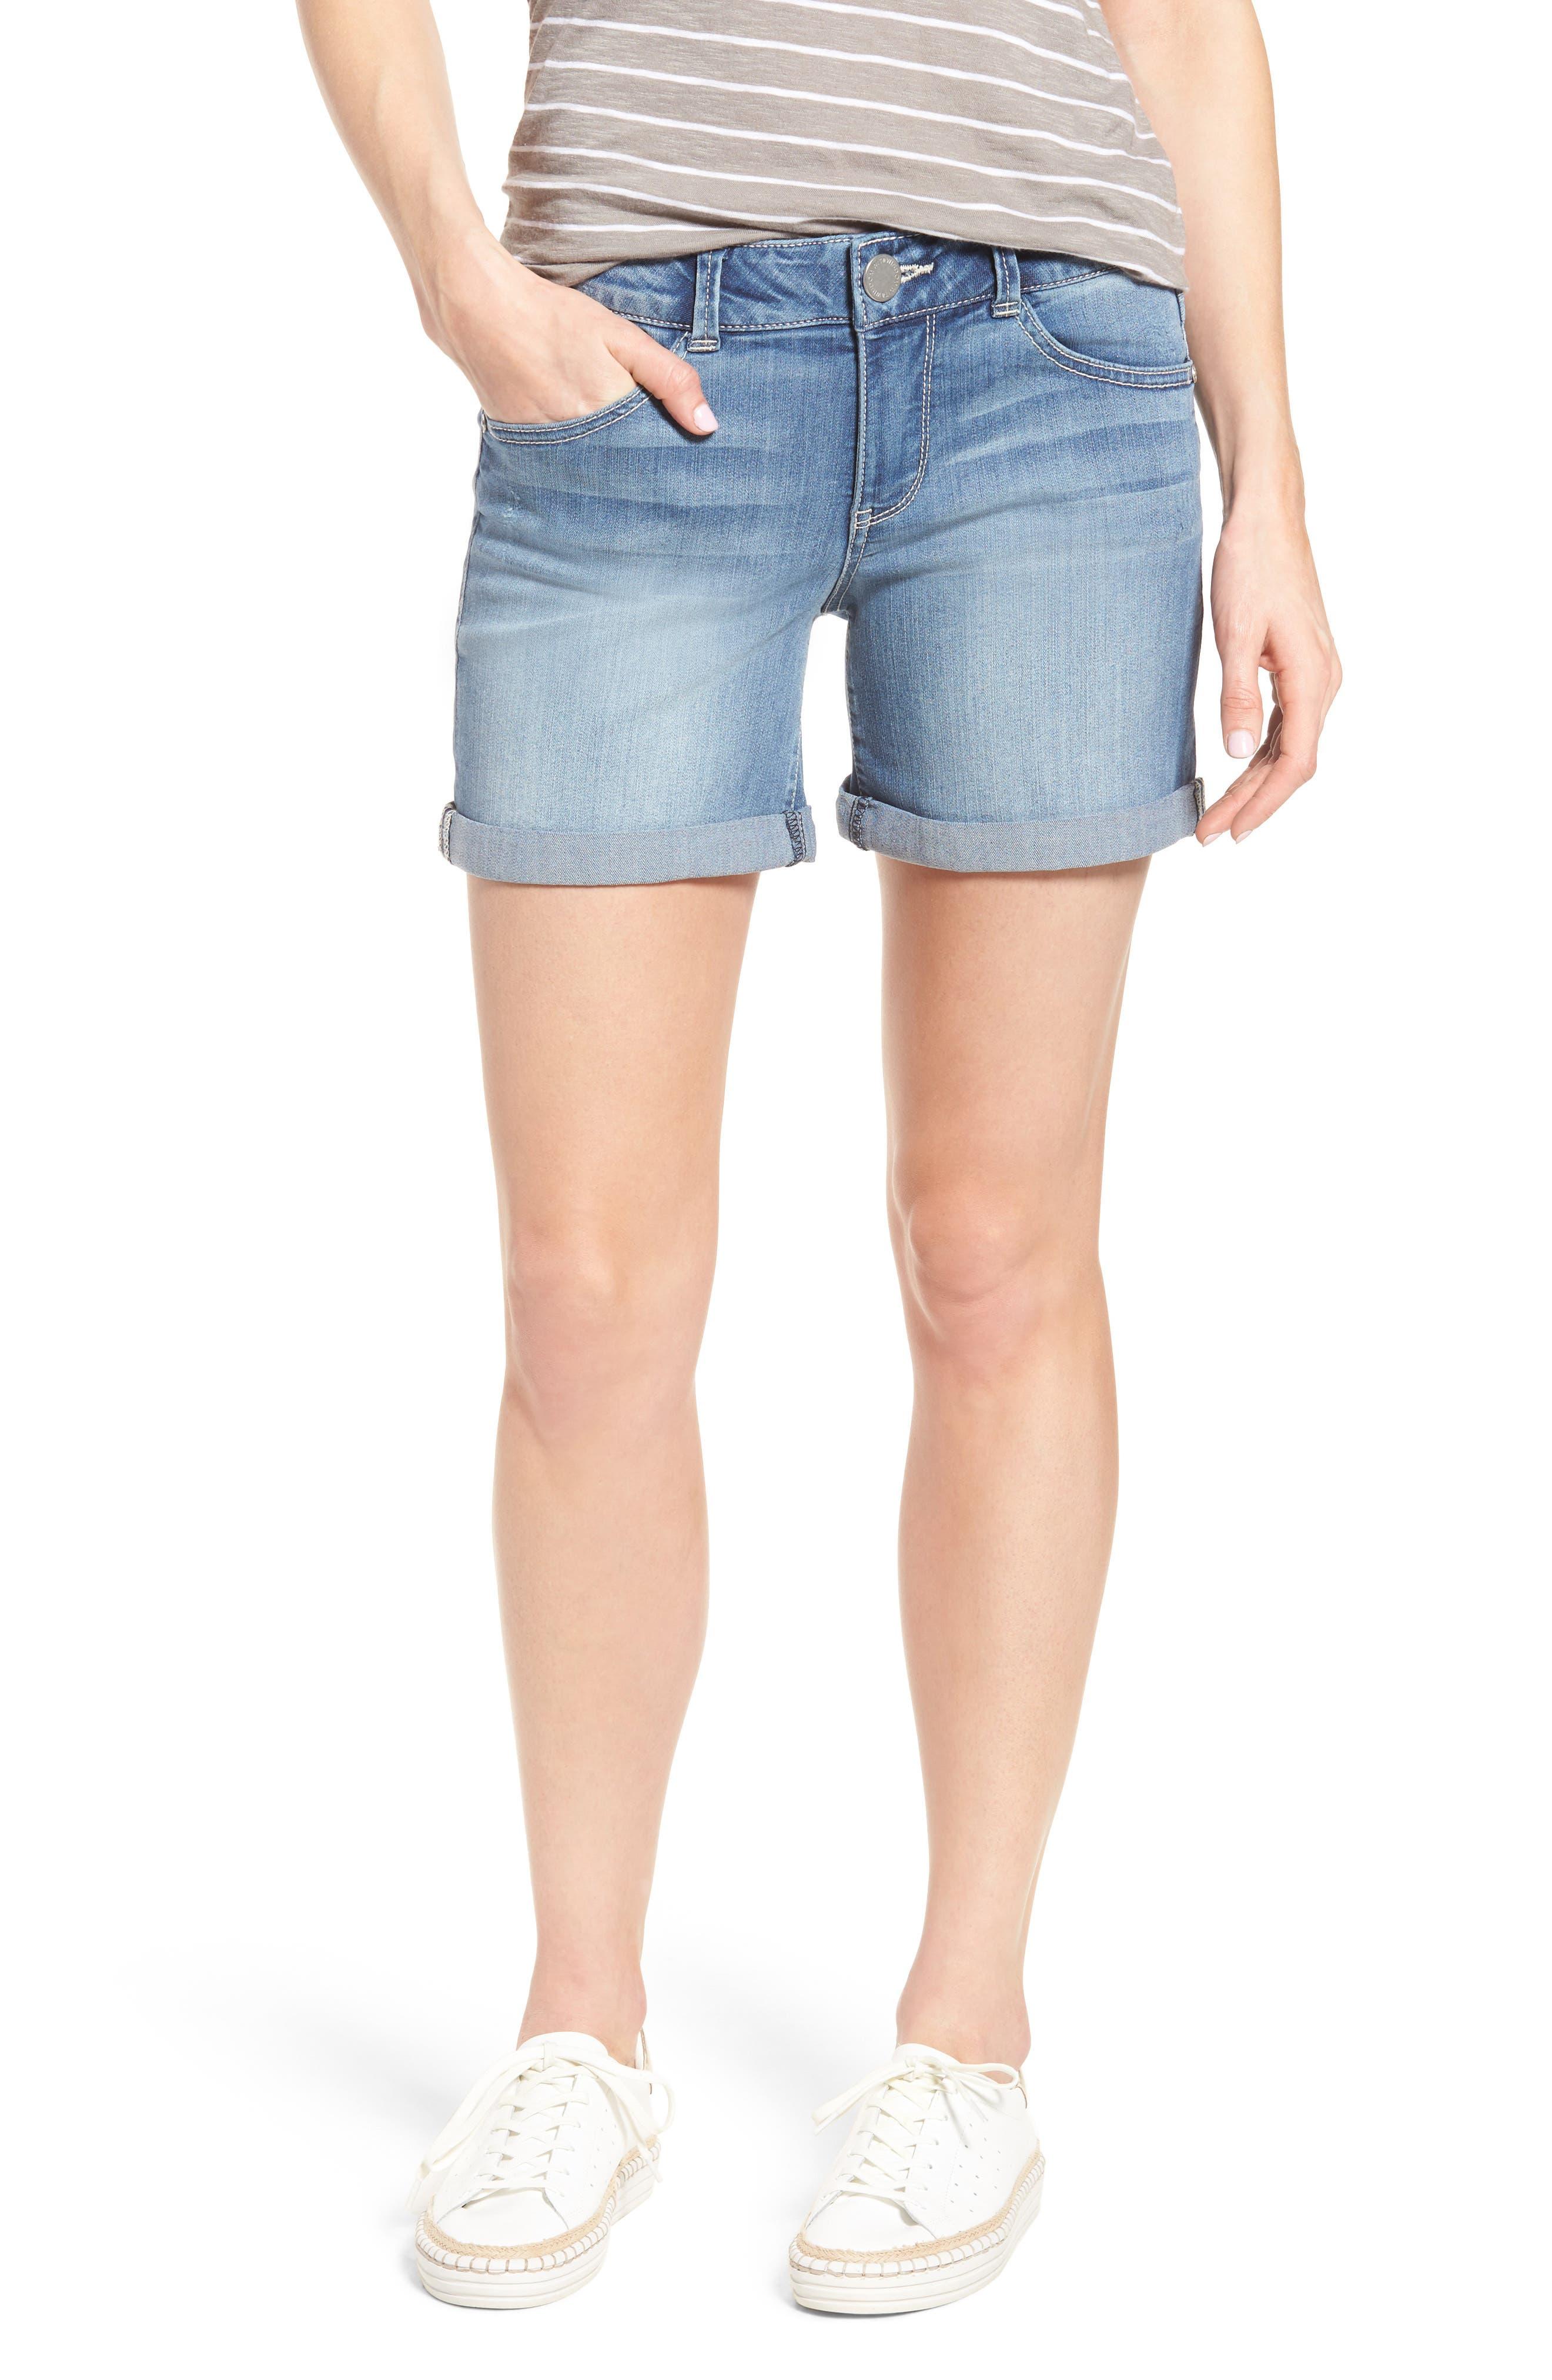 Ab-solution Cuffed Denim Shorts,                             Main thumbnail 1, color,                             458